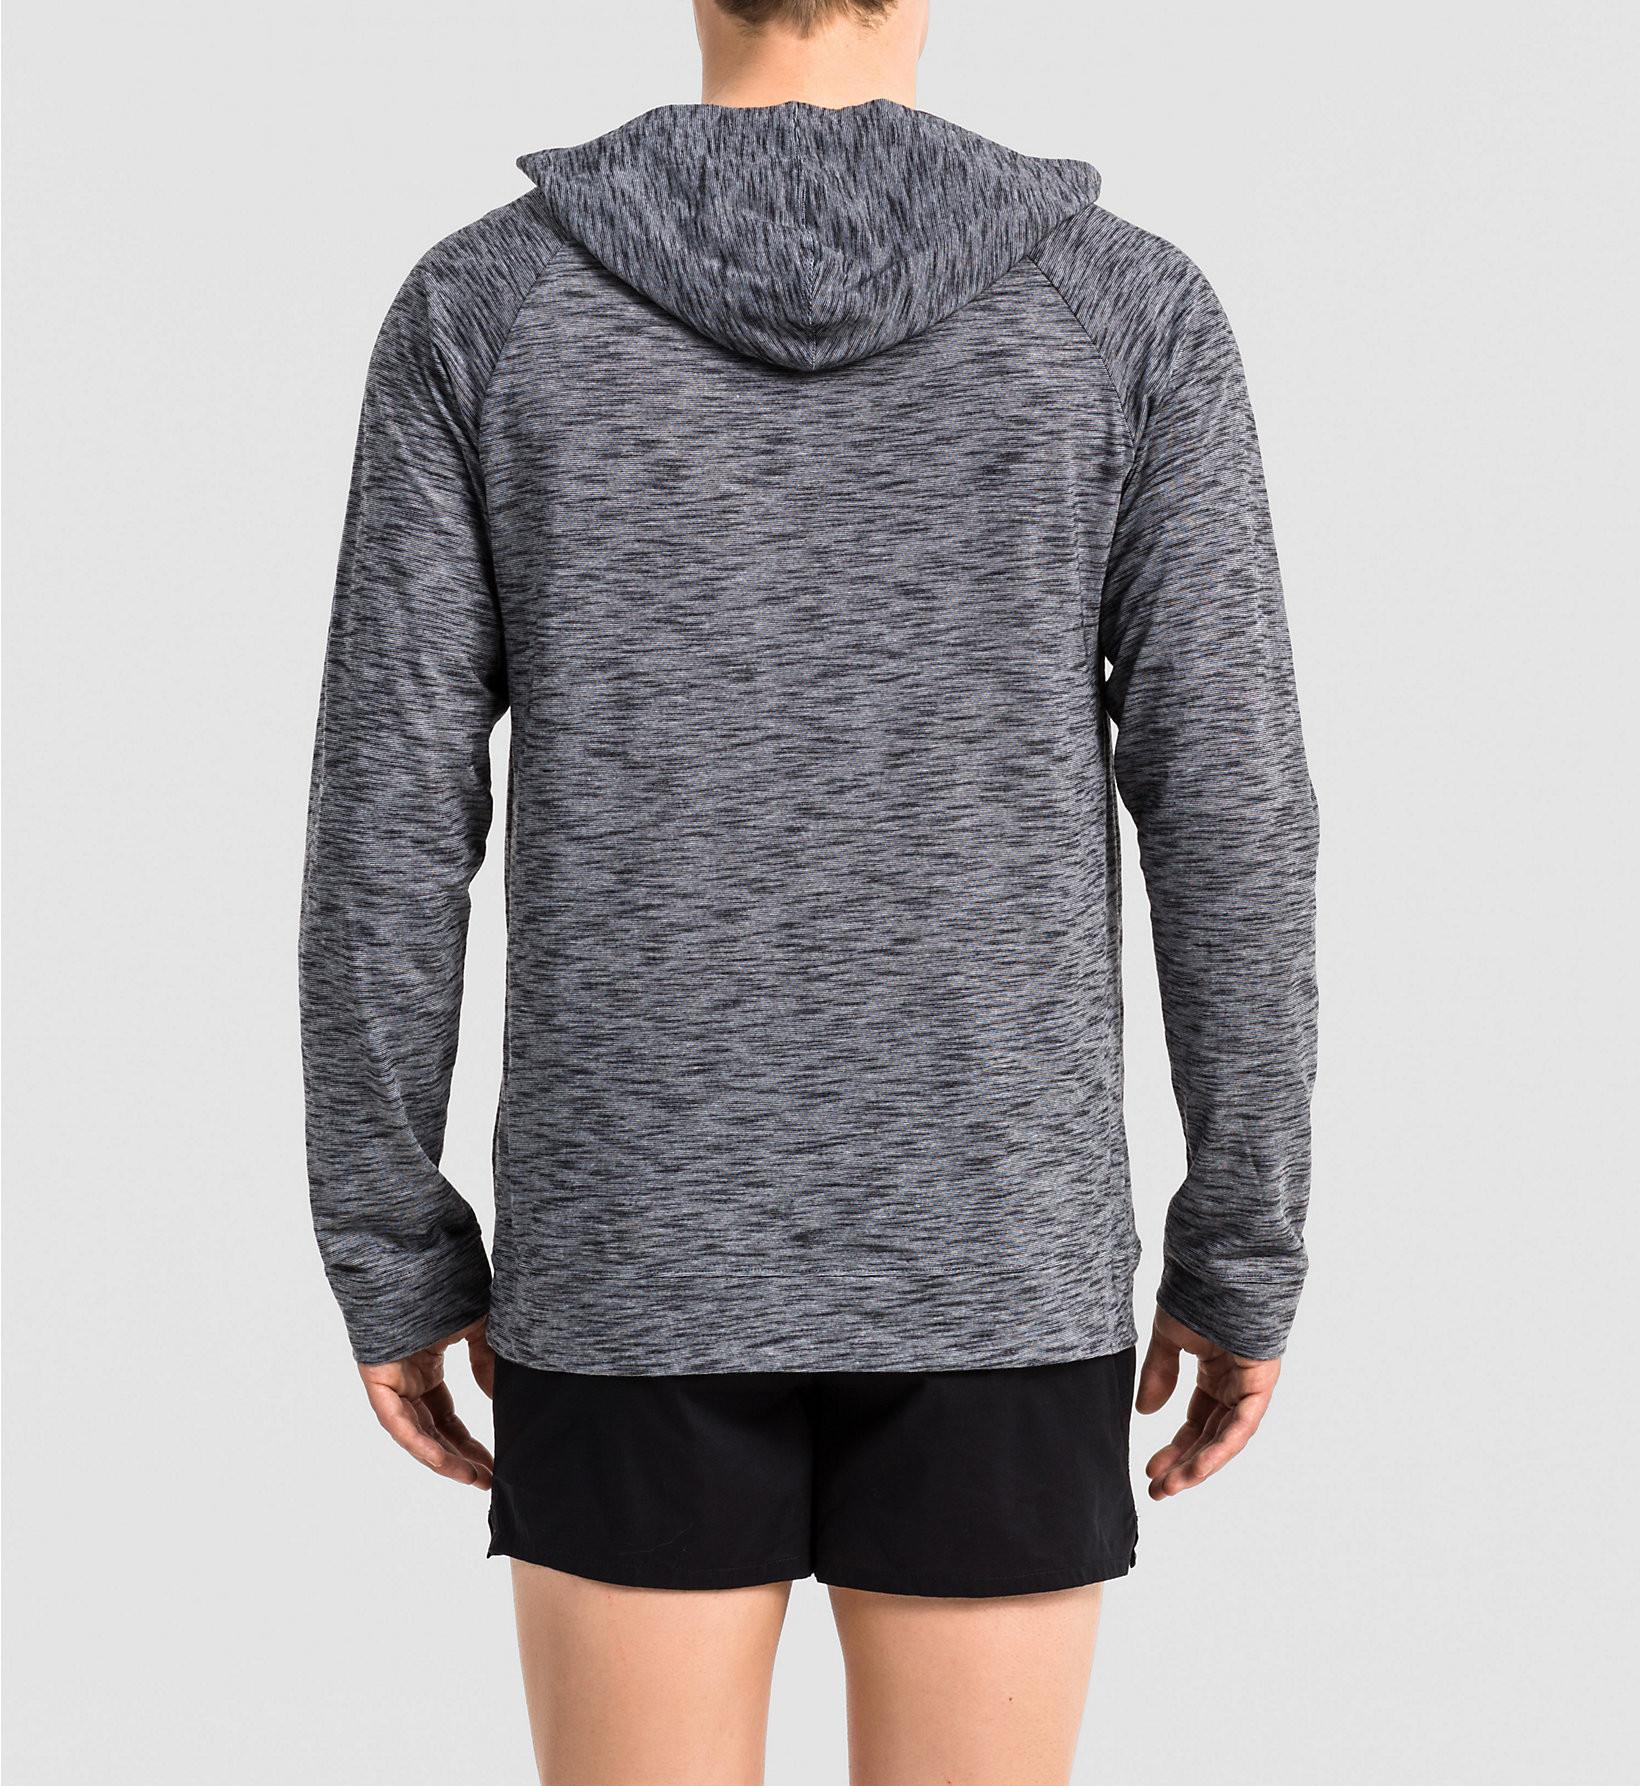 Pánská mikina NM1374E - Calvin Klein Barva: šedý melír, Velikost: L